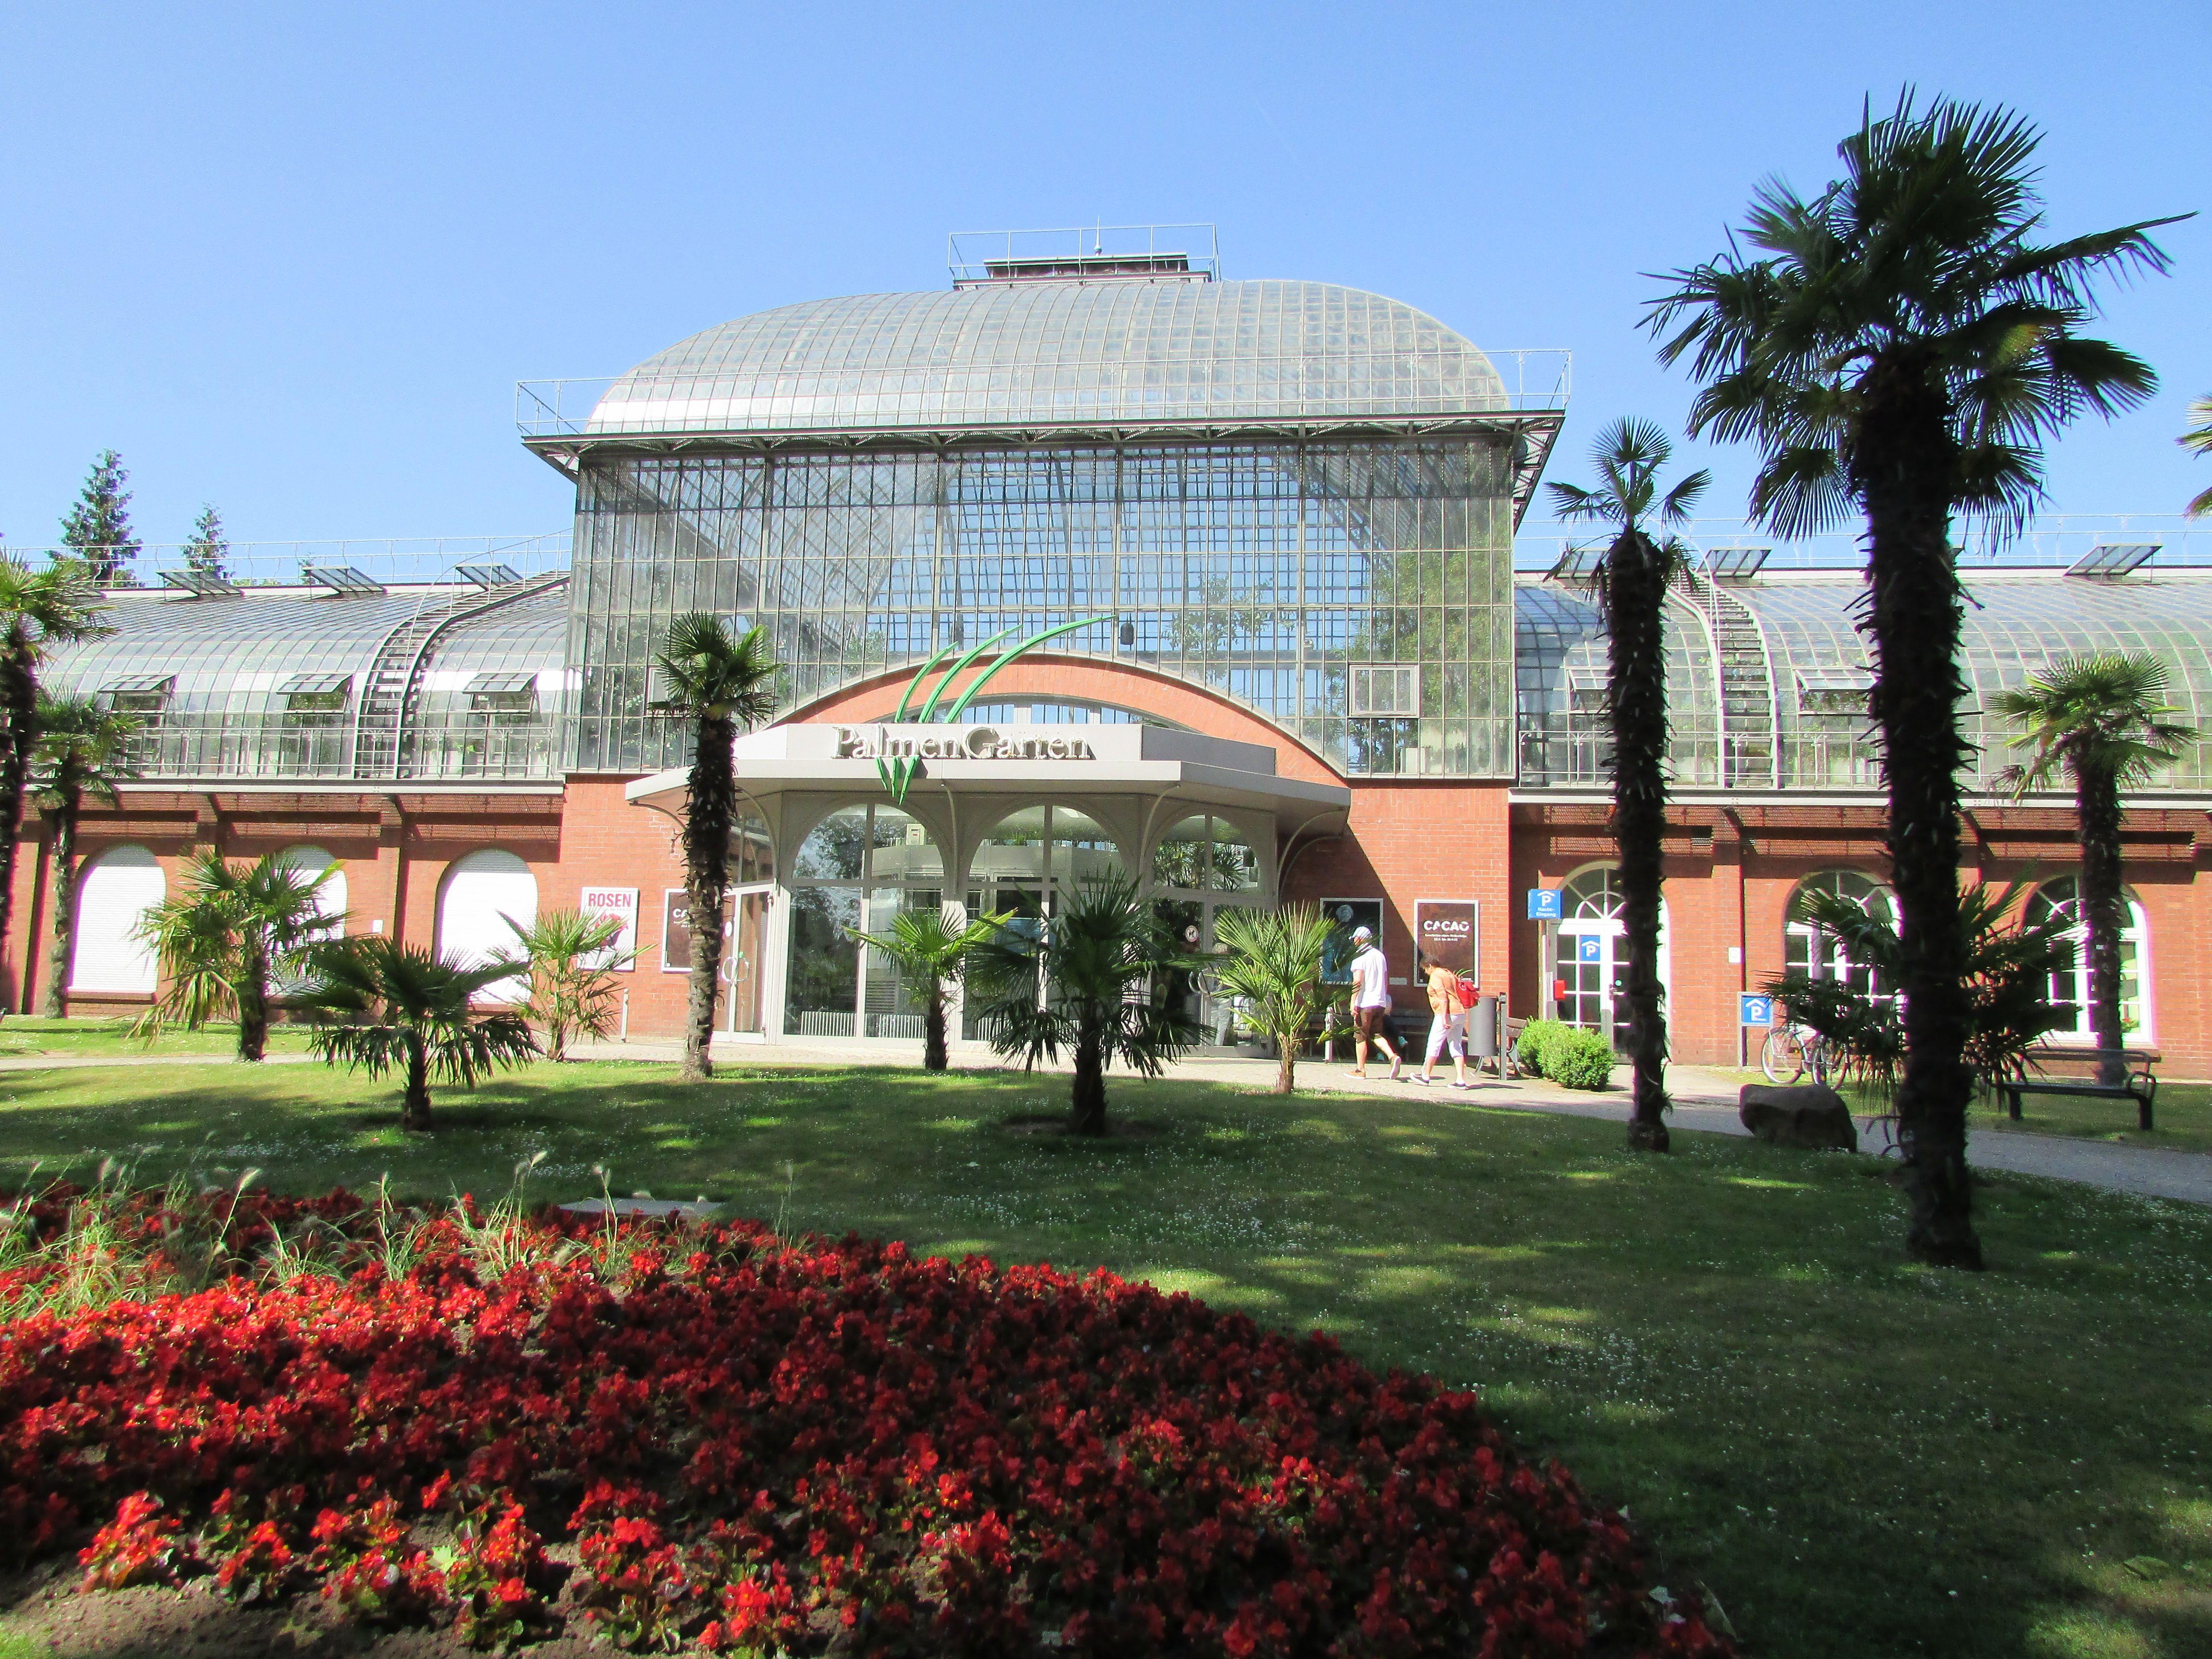 Great PalmenGarten Frankfurt Germany By Ninik Becker travel